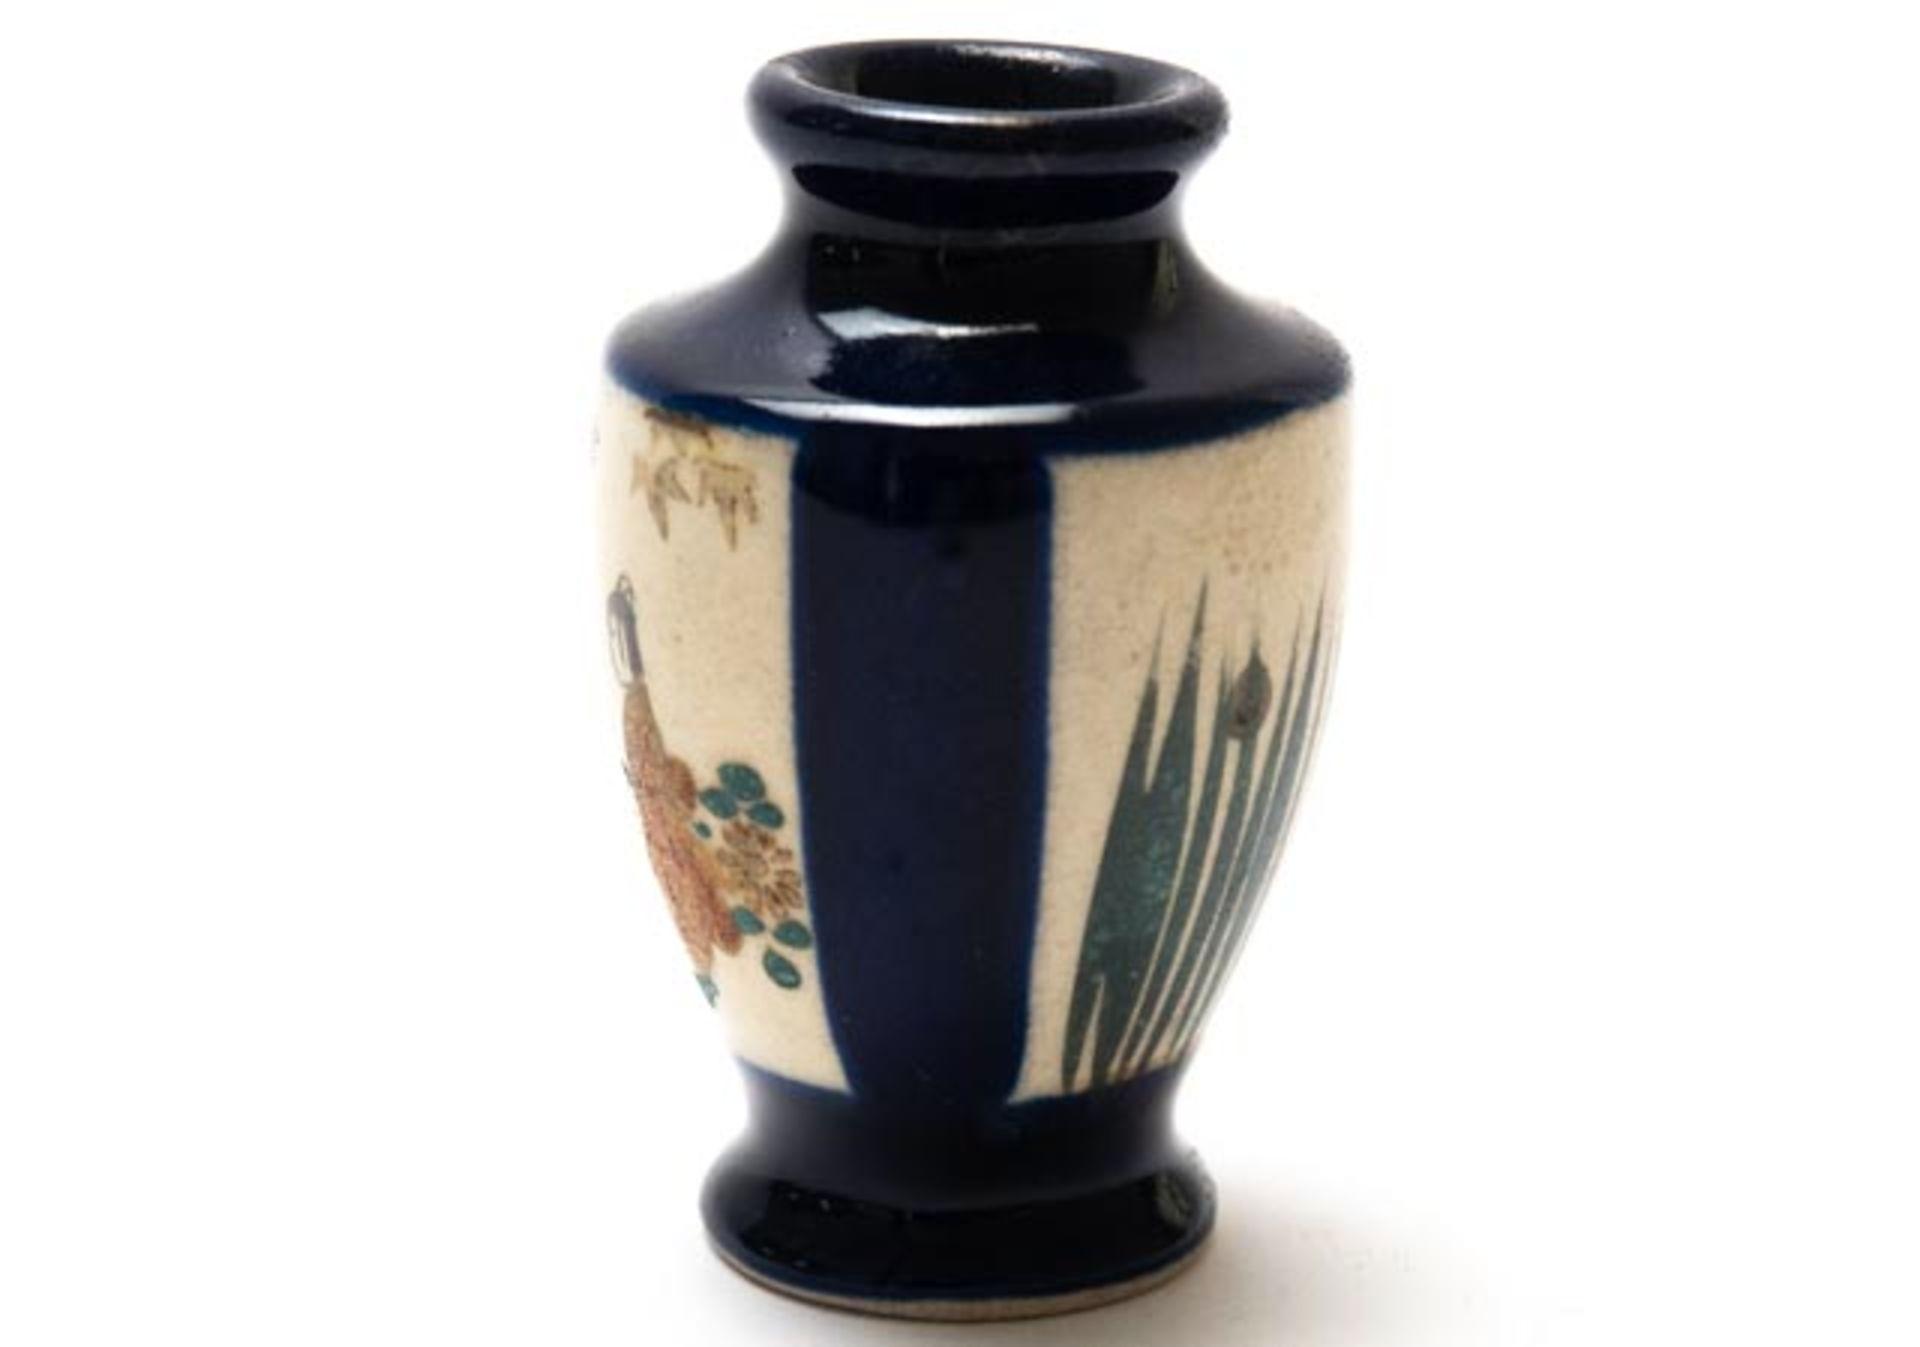 Chinesische Vase - Image 2 of 5